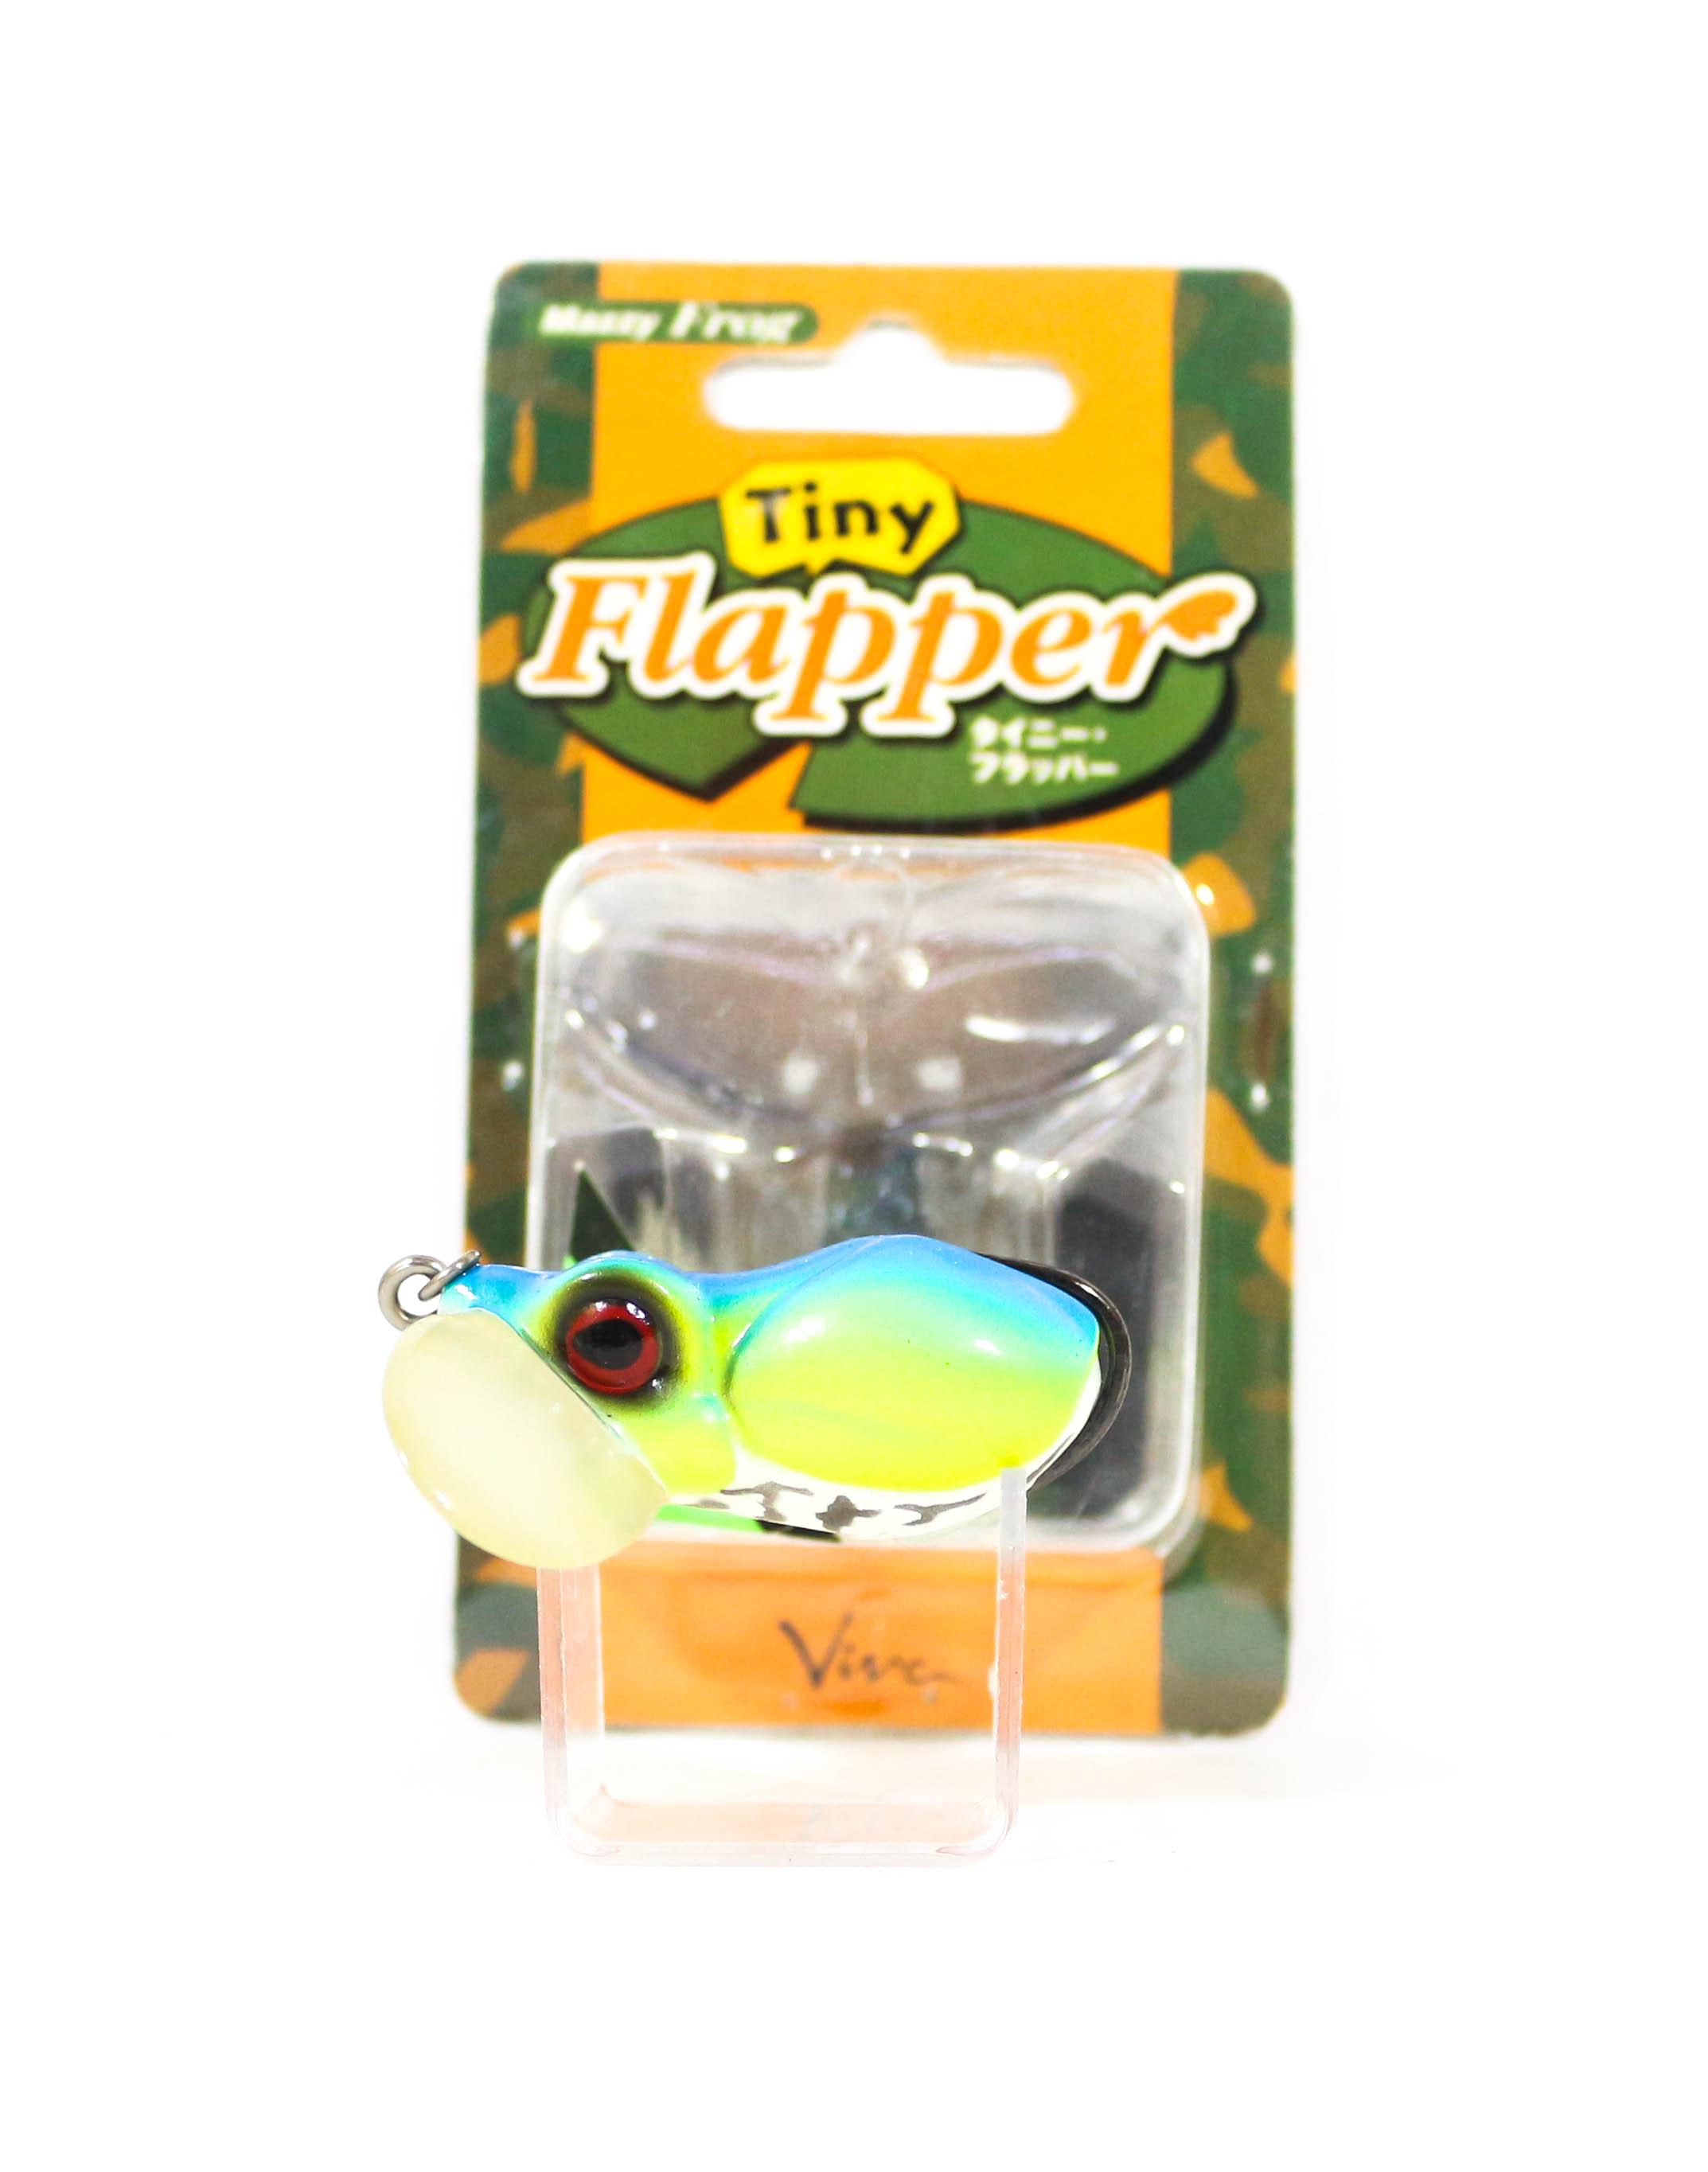 Sale Viva Tiny Flapper Weedlesss Frog 40 mm Floating Lure 19 (6137)